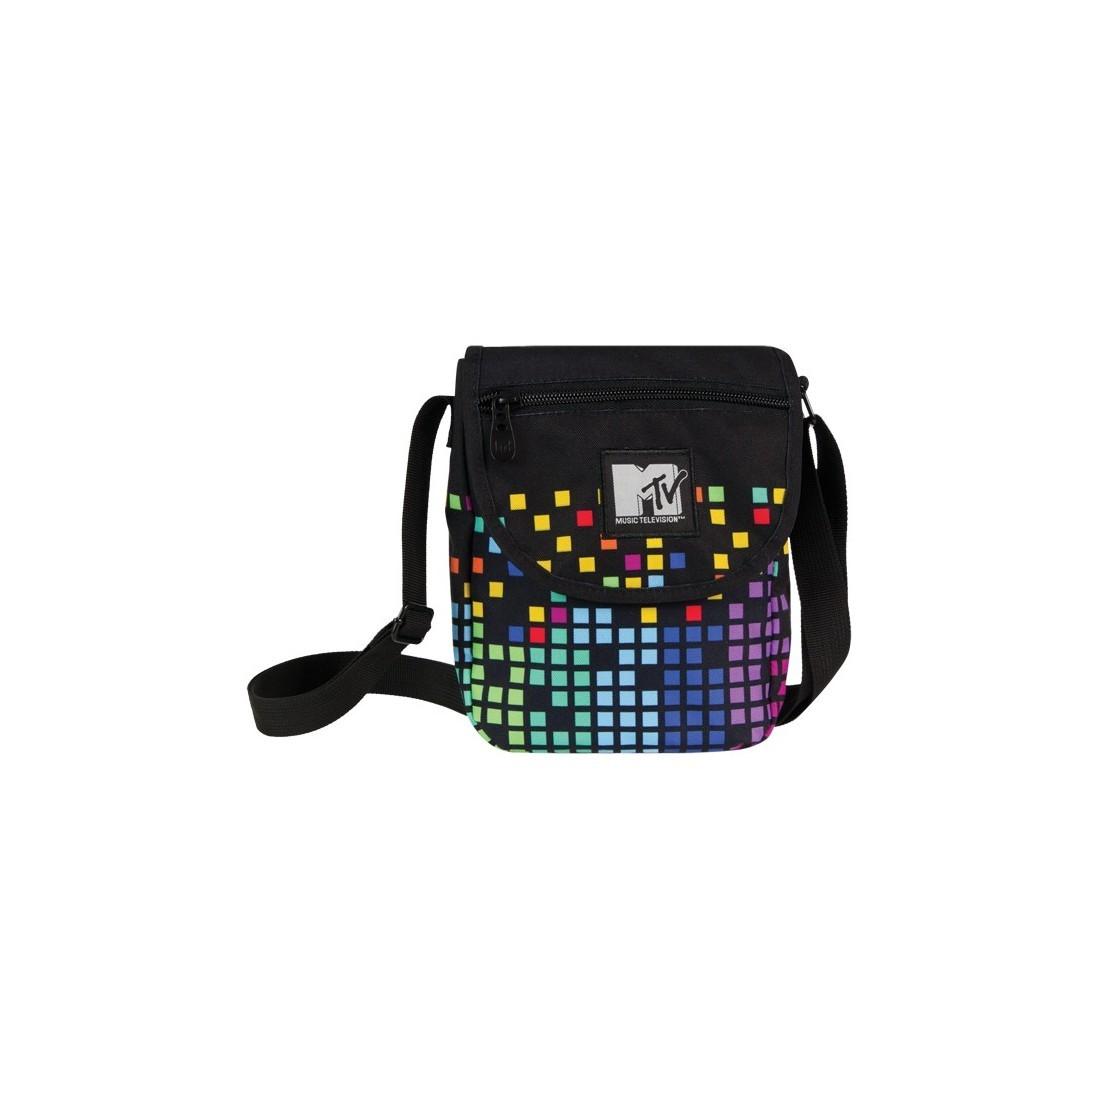 Mała torebka na ramię Coolpack Mtv Equalizer - plecak-tornister.pl